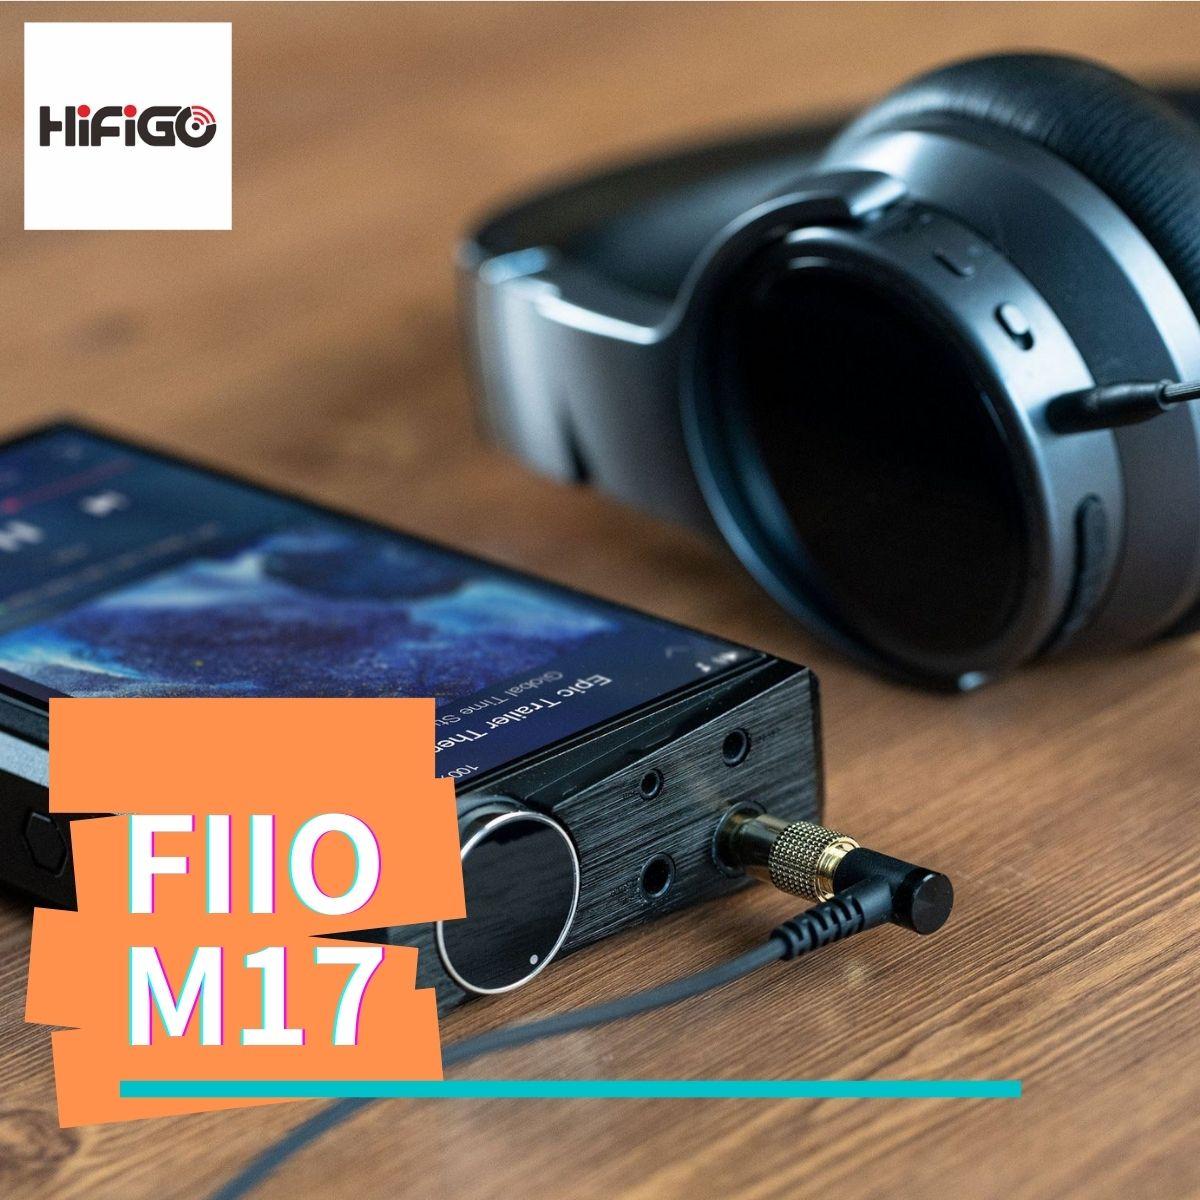 【HiFiGOニュース】FiiO M17:全能のフラッグシップ・ミュージック・プレーヤーまもなく降臨